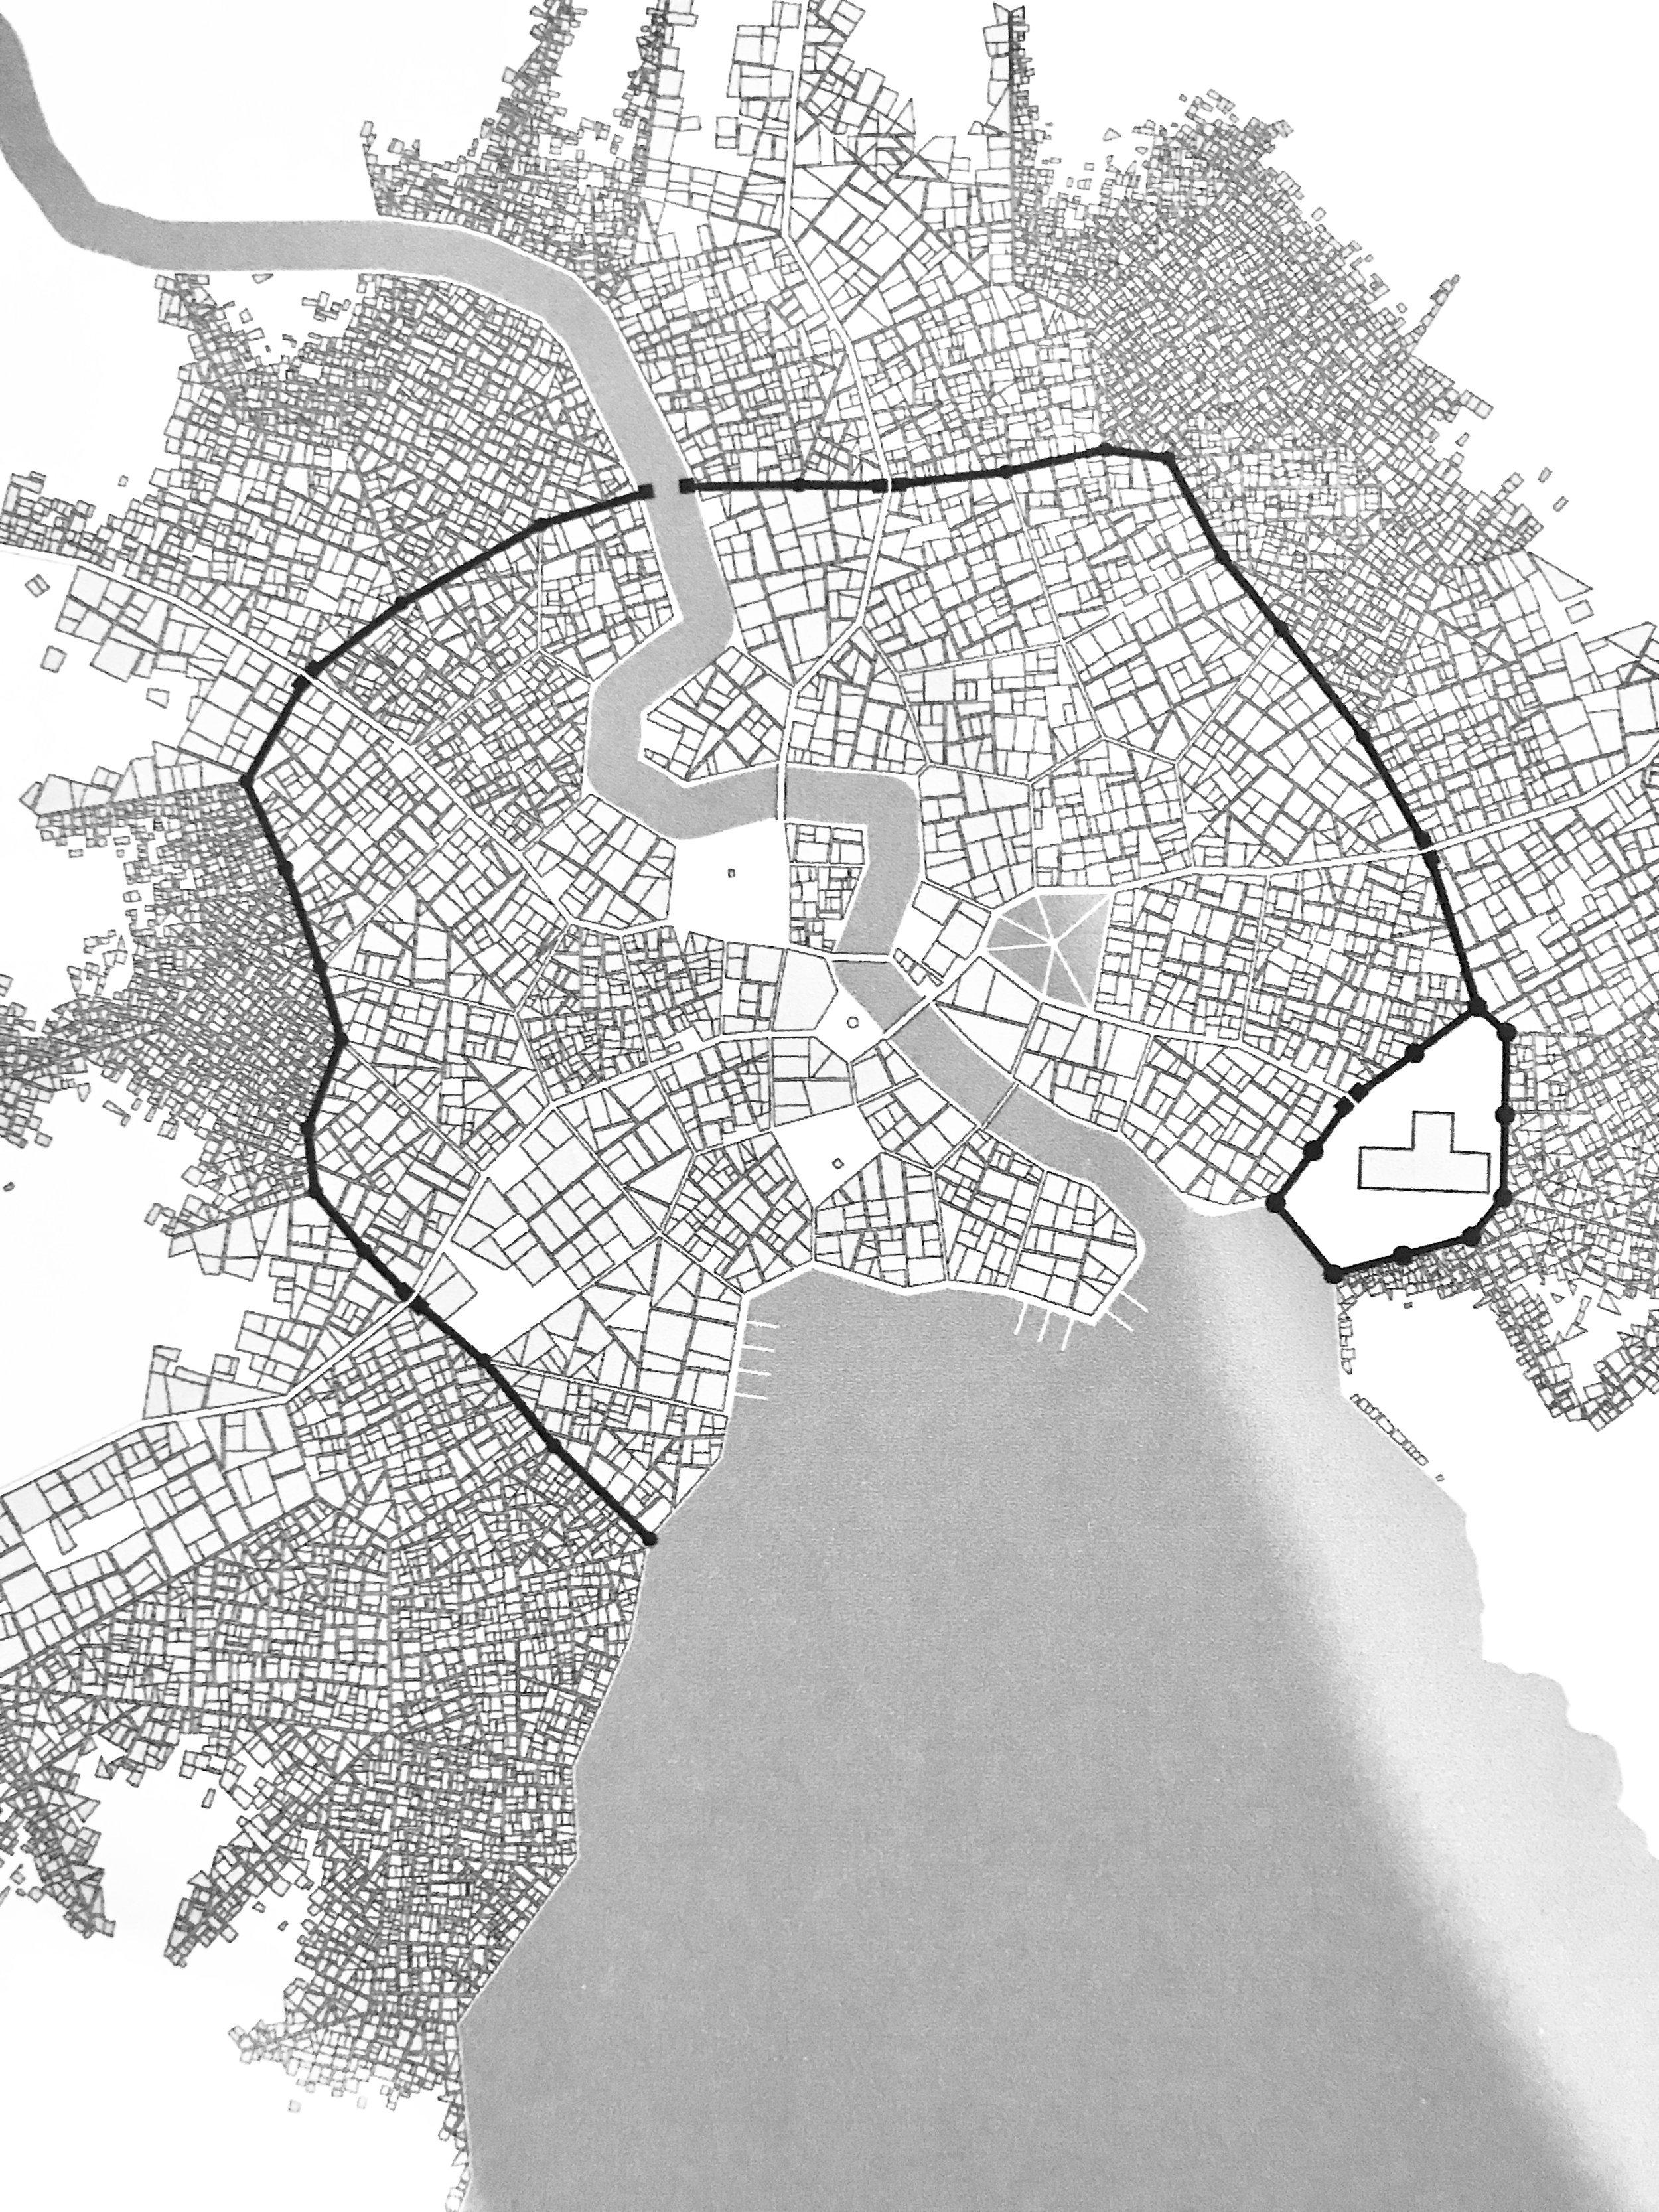 City of Audacious